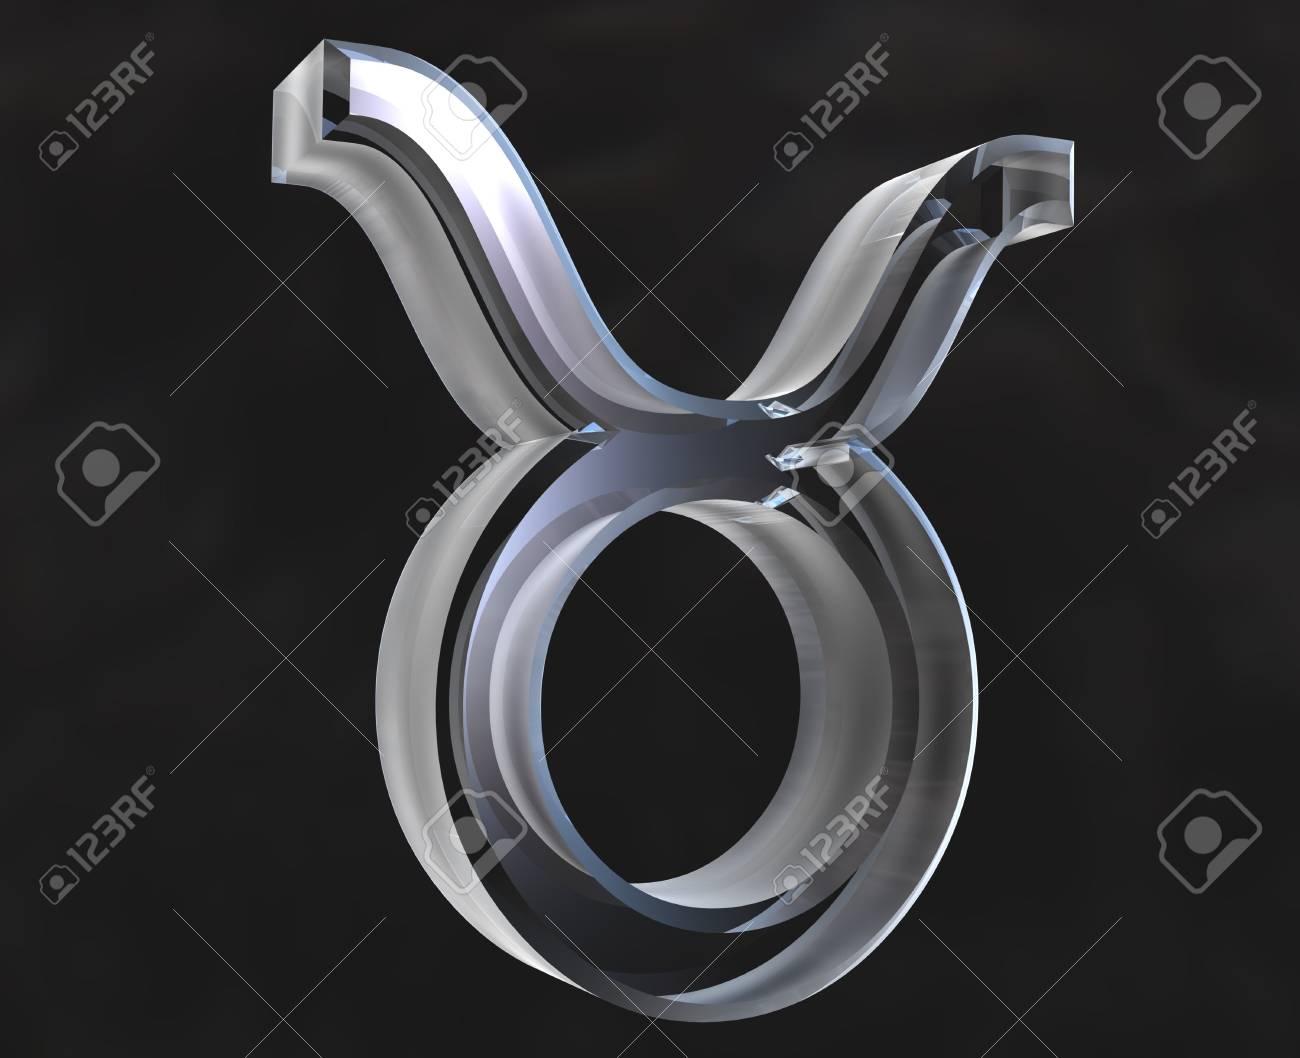 Taurus Astrology Symbol In Transparent Glass 3d Stock Photo